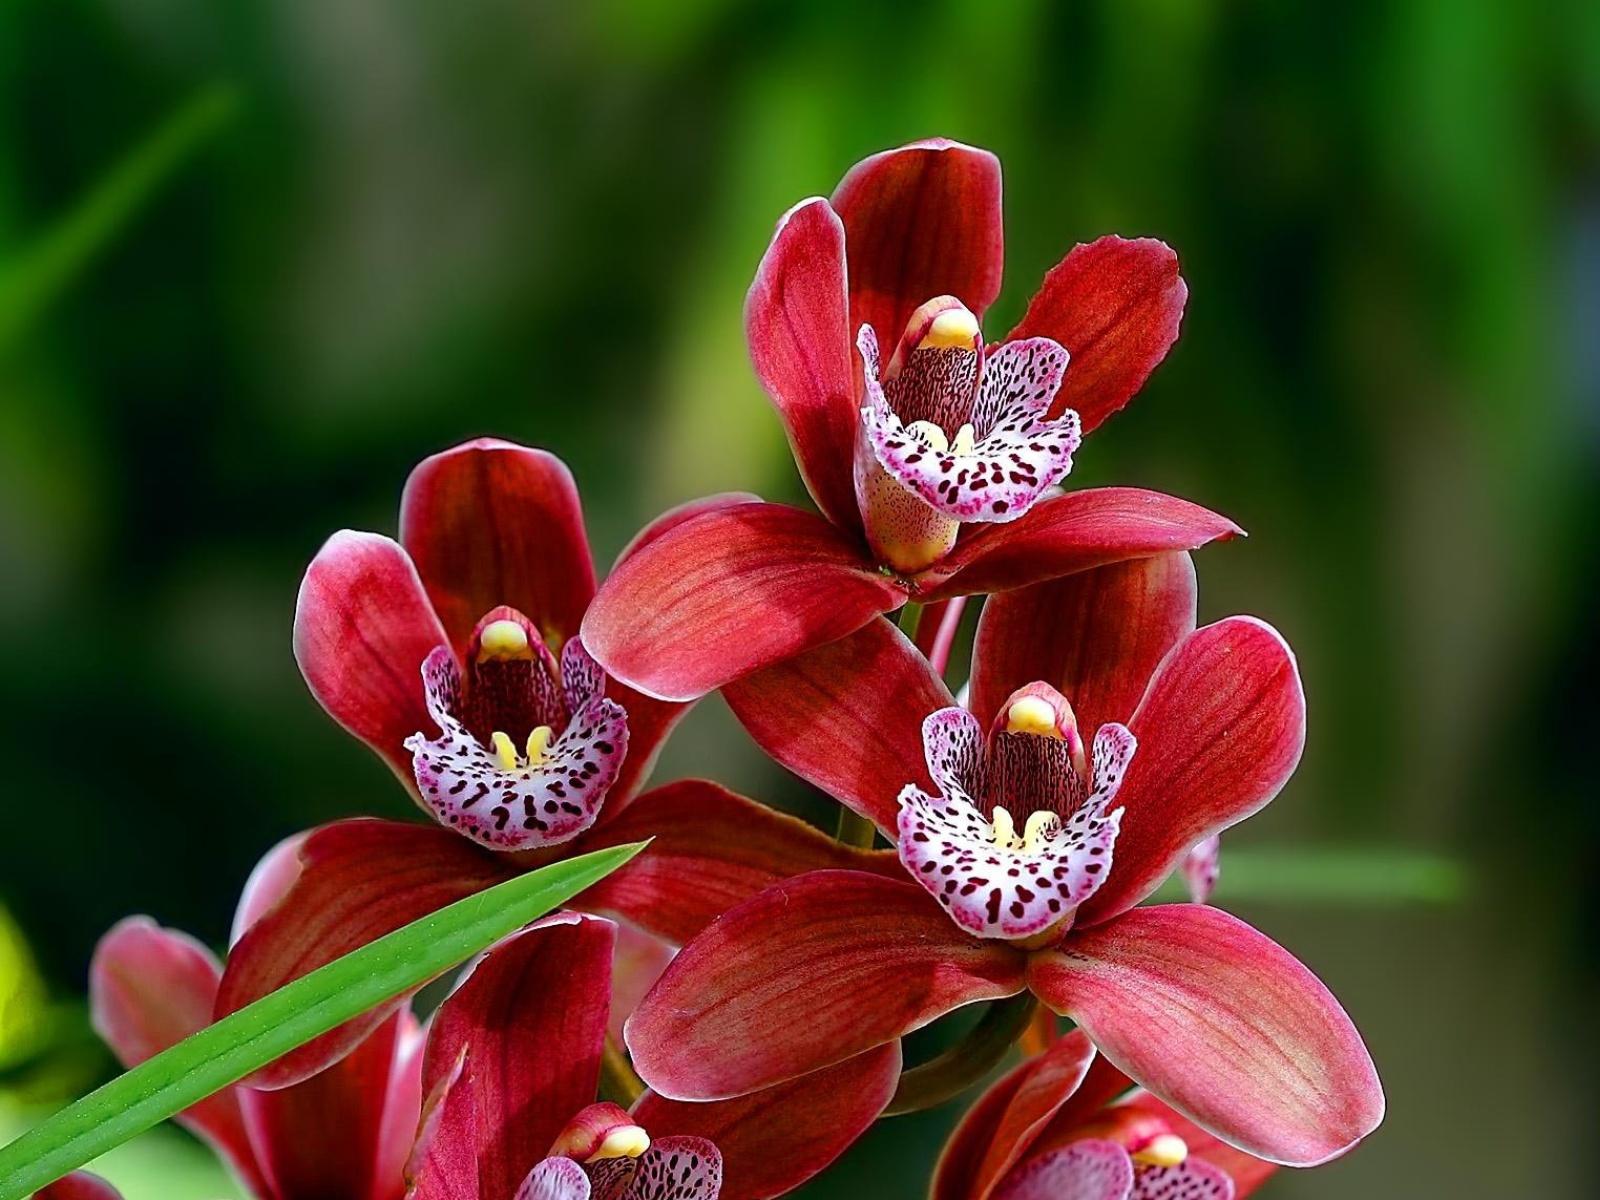 Shenzhen Nongke Orchid Images